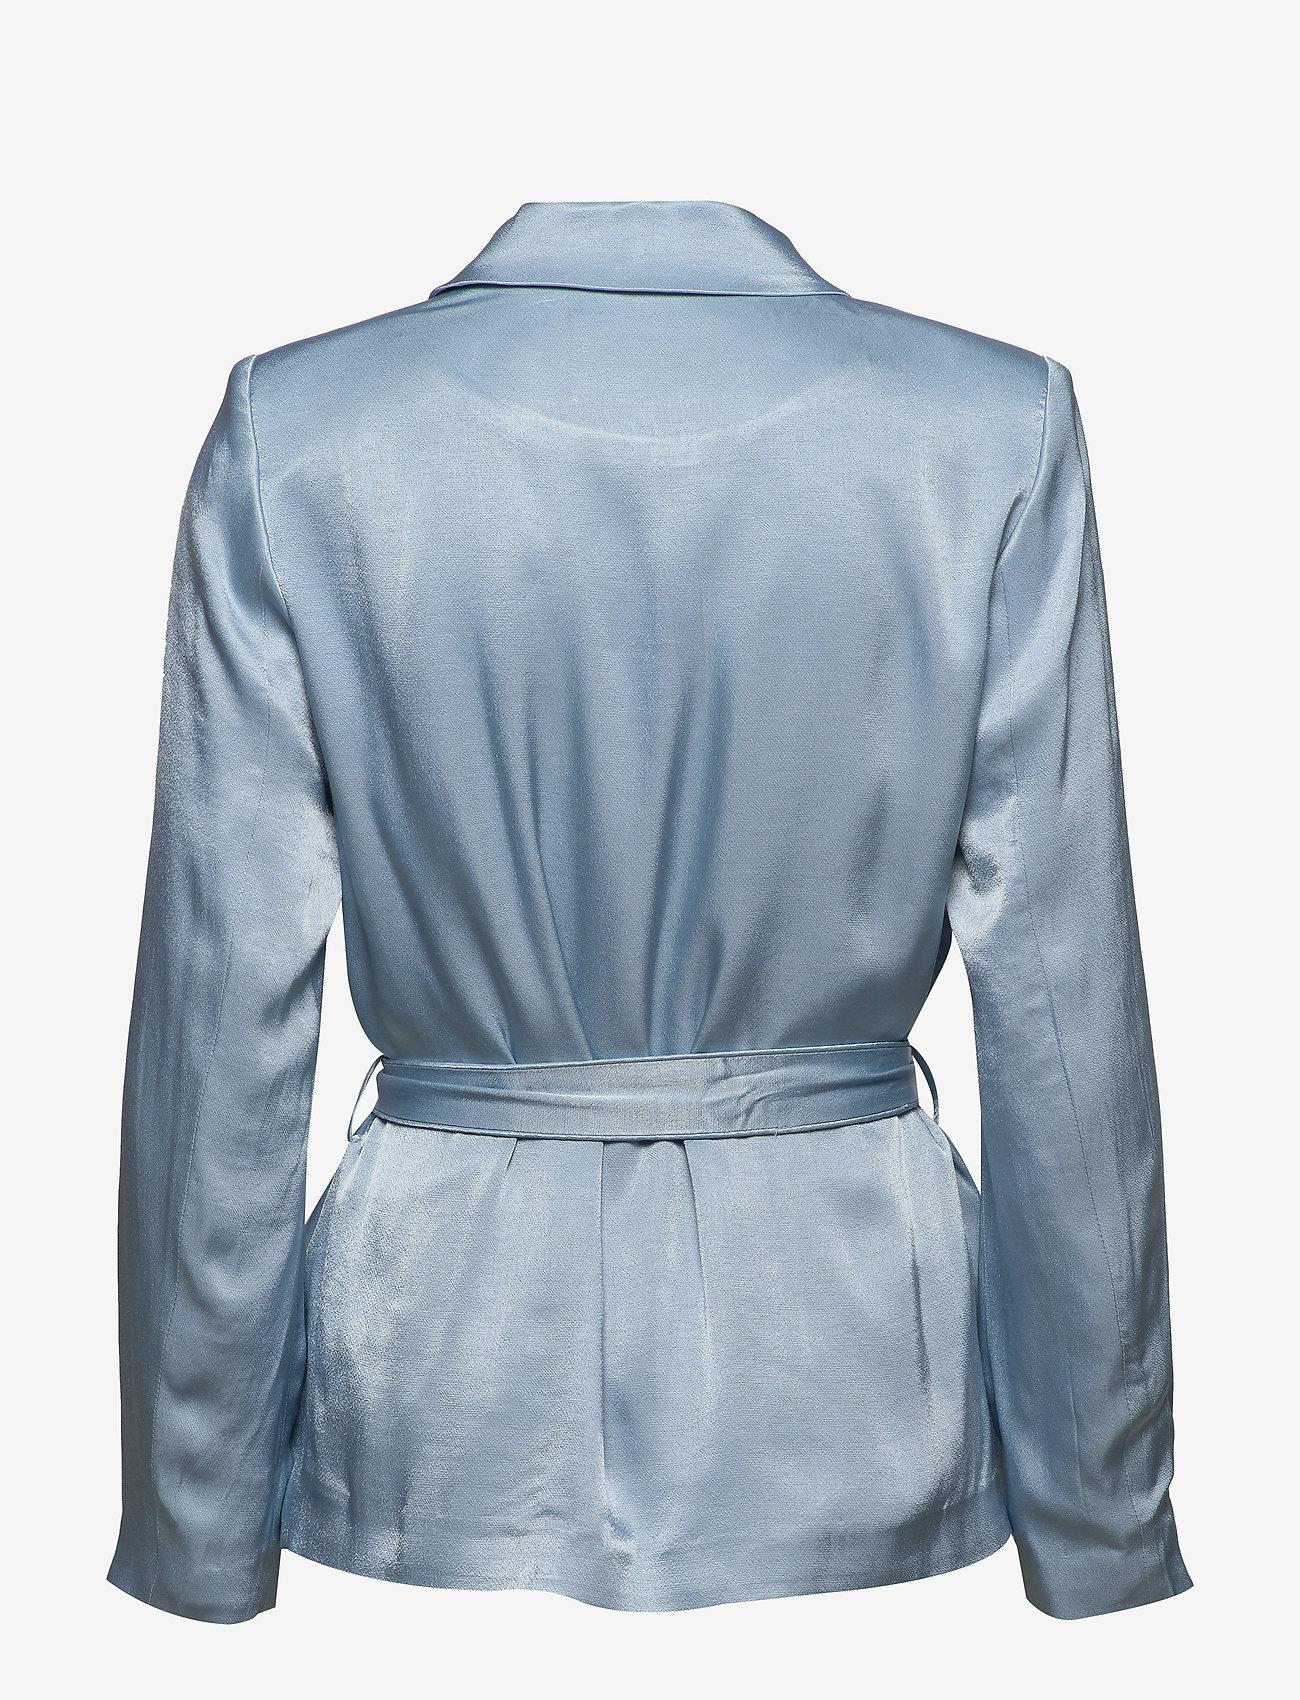 Sofia Liera Blazer (Blue Mist) (95.97 €) - Bruuns Bazaar BE7Dr